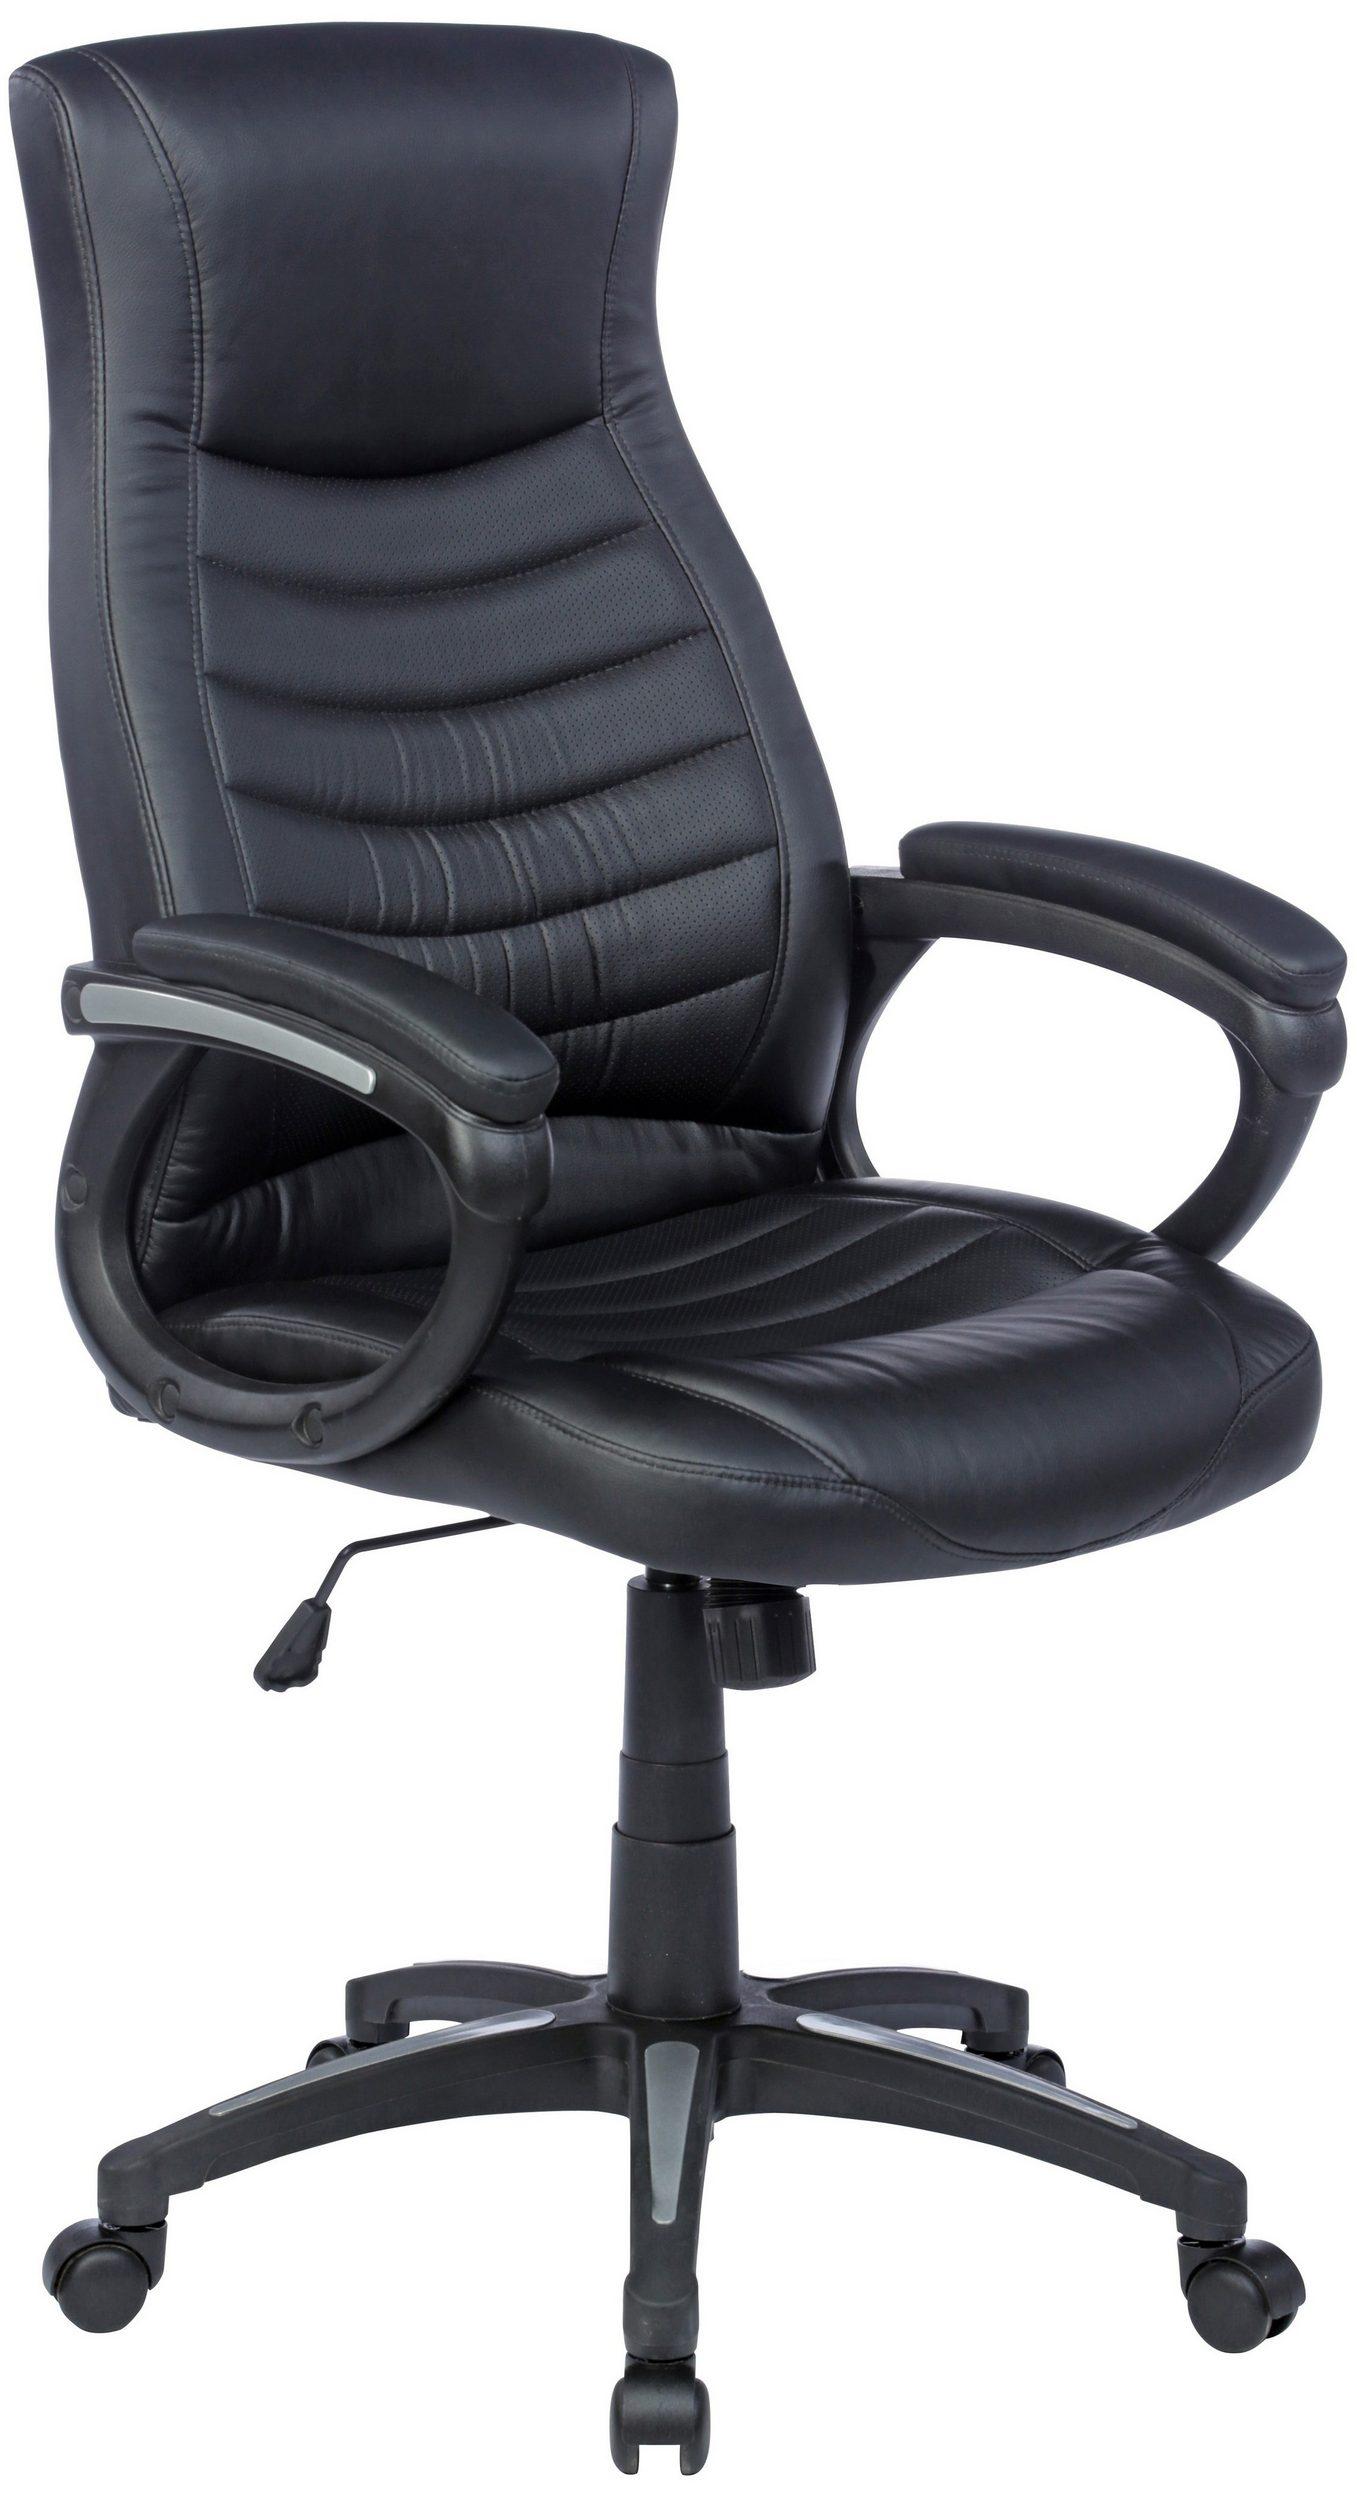 DAMIAN Büro-Chefsessel